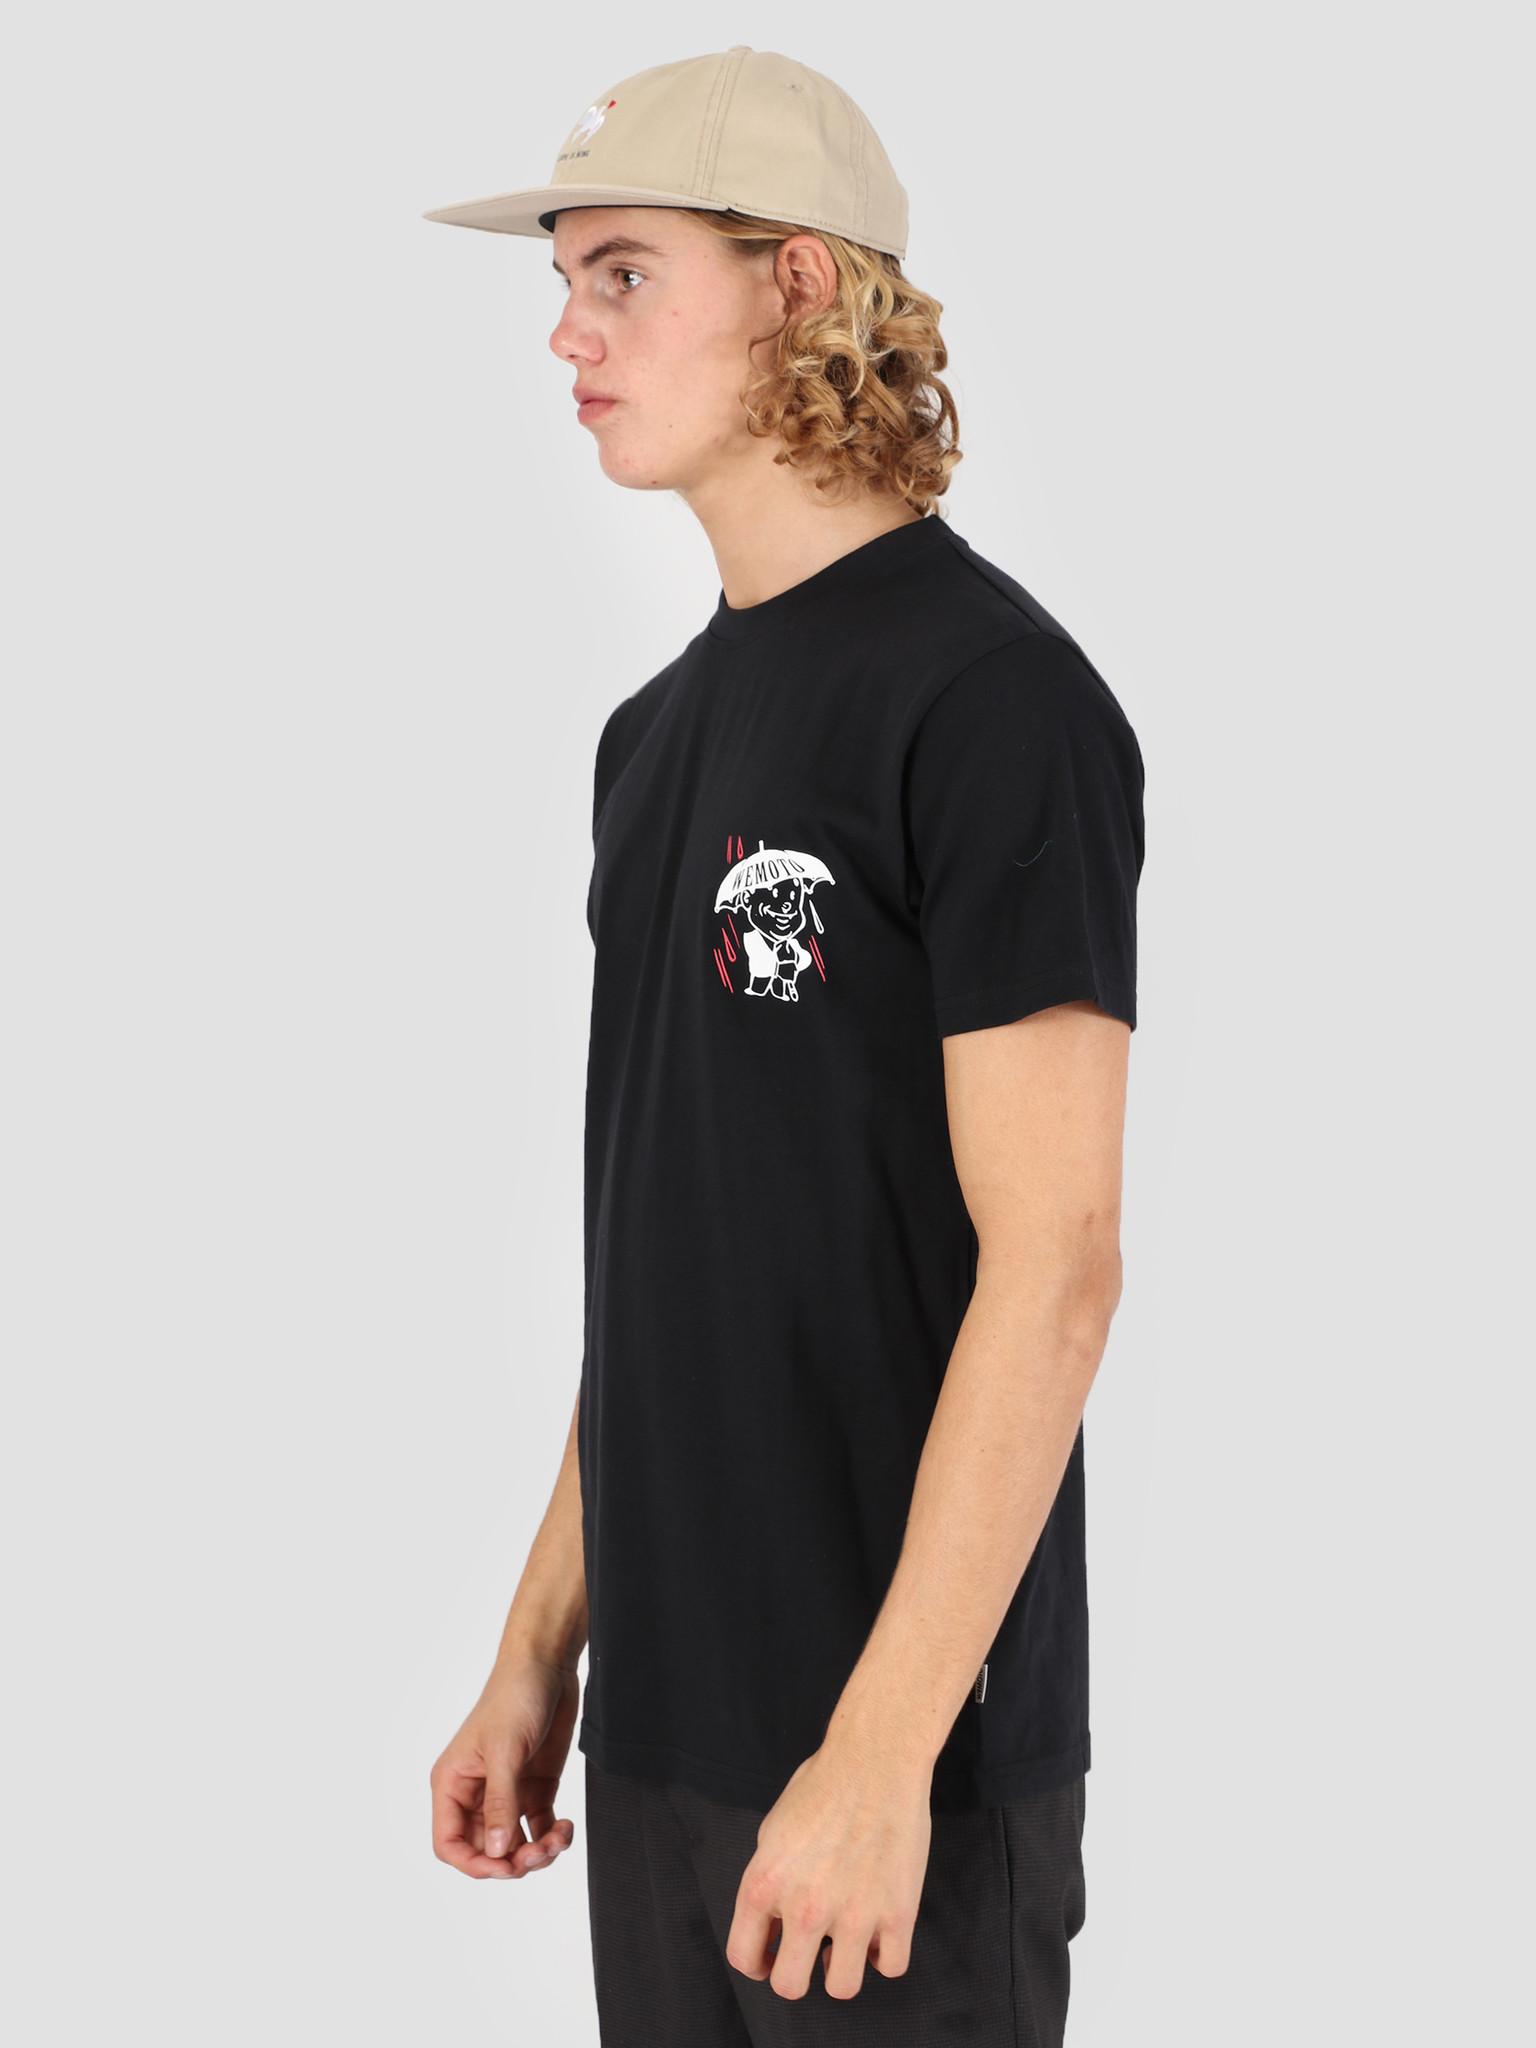 Wemoto Wemoto Company T-Shirt Black 131.120-100